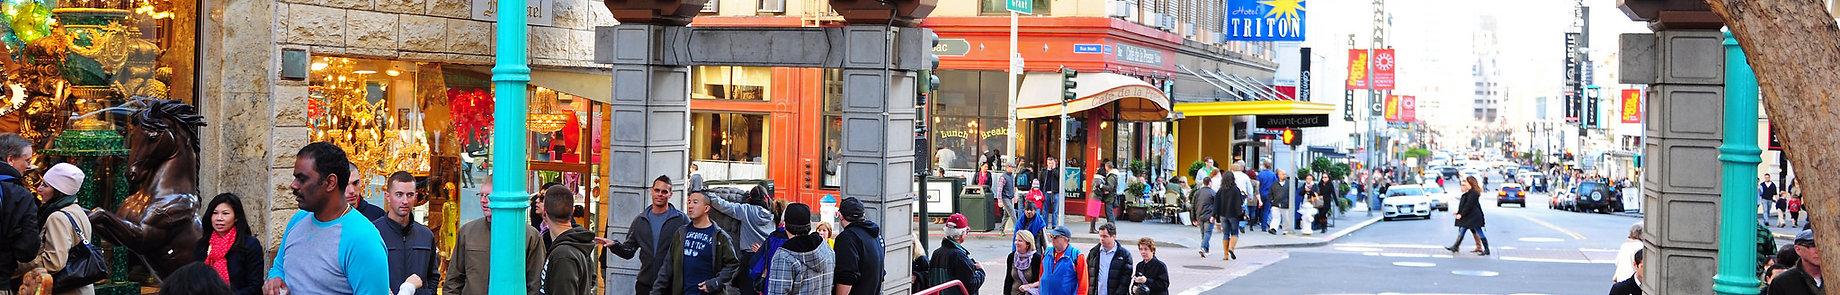 Street view of Grant Street, San Francisco